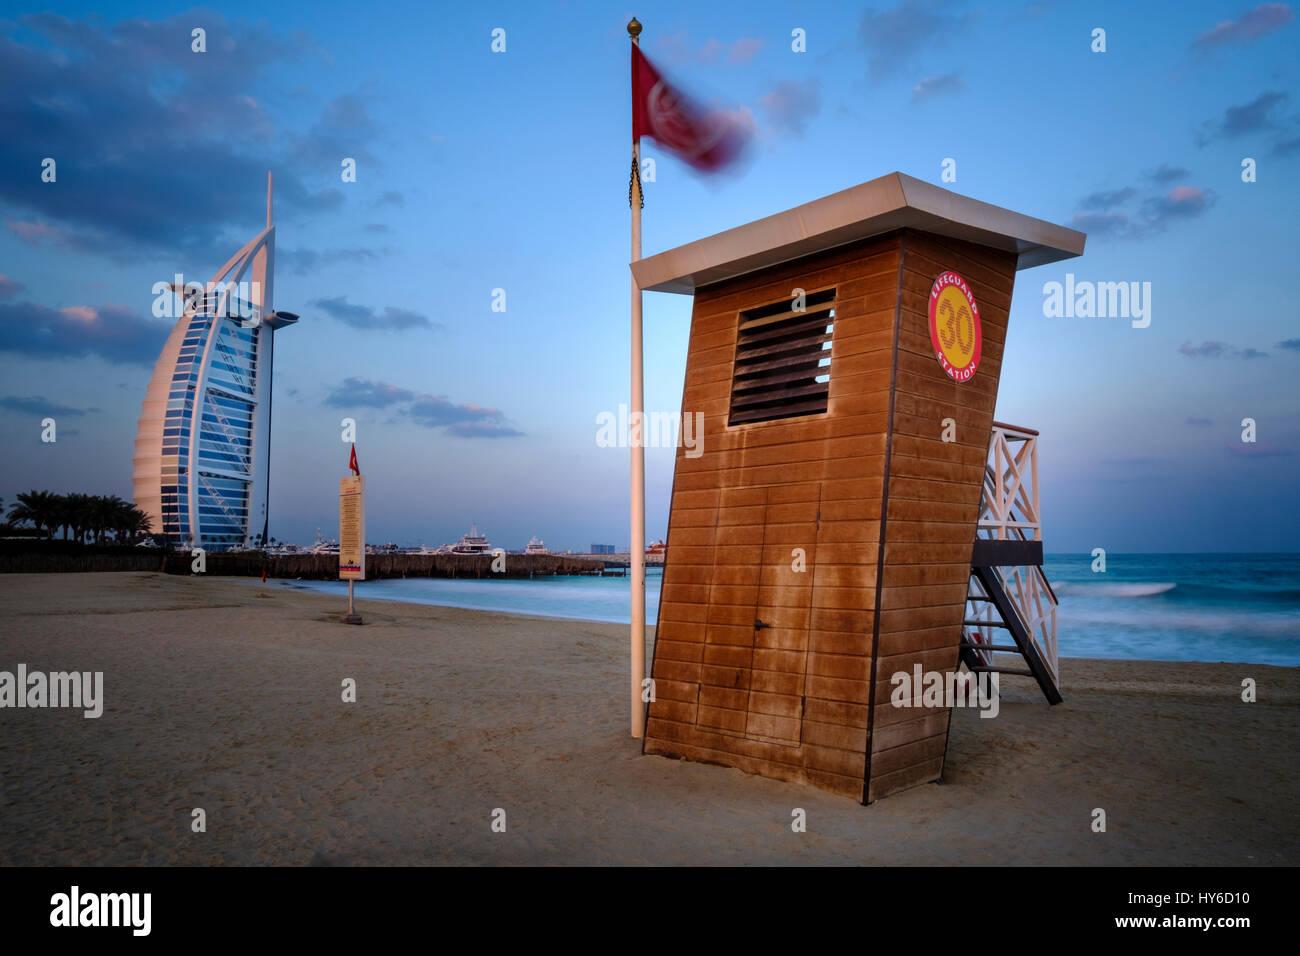 Vereinigte Arabische Emirate, DUBAI - ca. Januar 2017: Strandwache am Jumeirah Public Beach bei Sonnenaufgang. mit Stockfoto